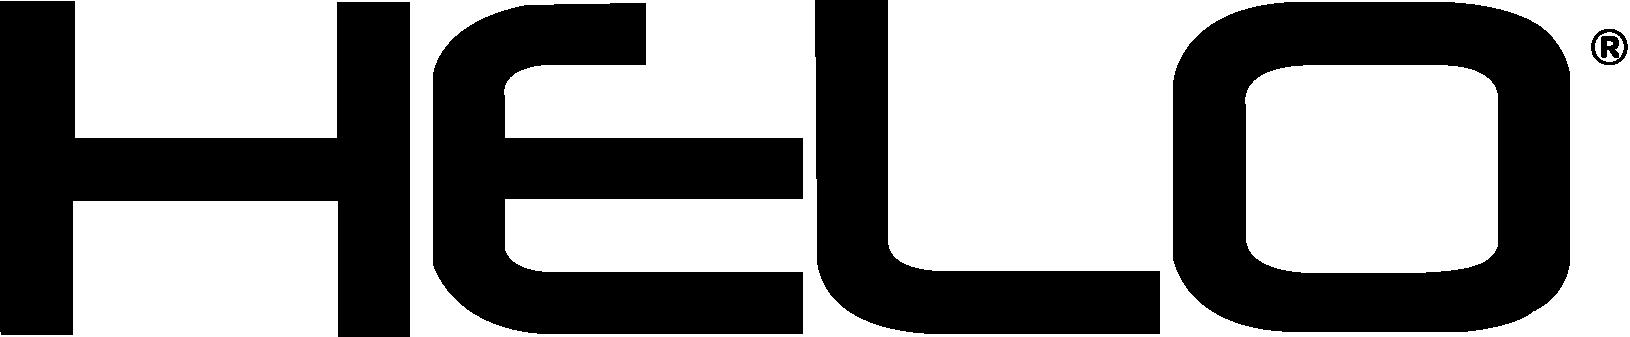 Helo HE901 Black 20x9 6x120 18mm HE90129077718